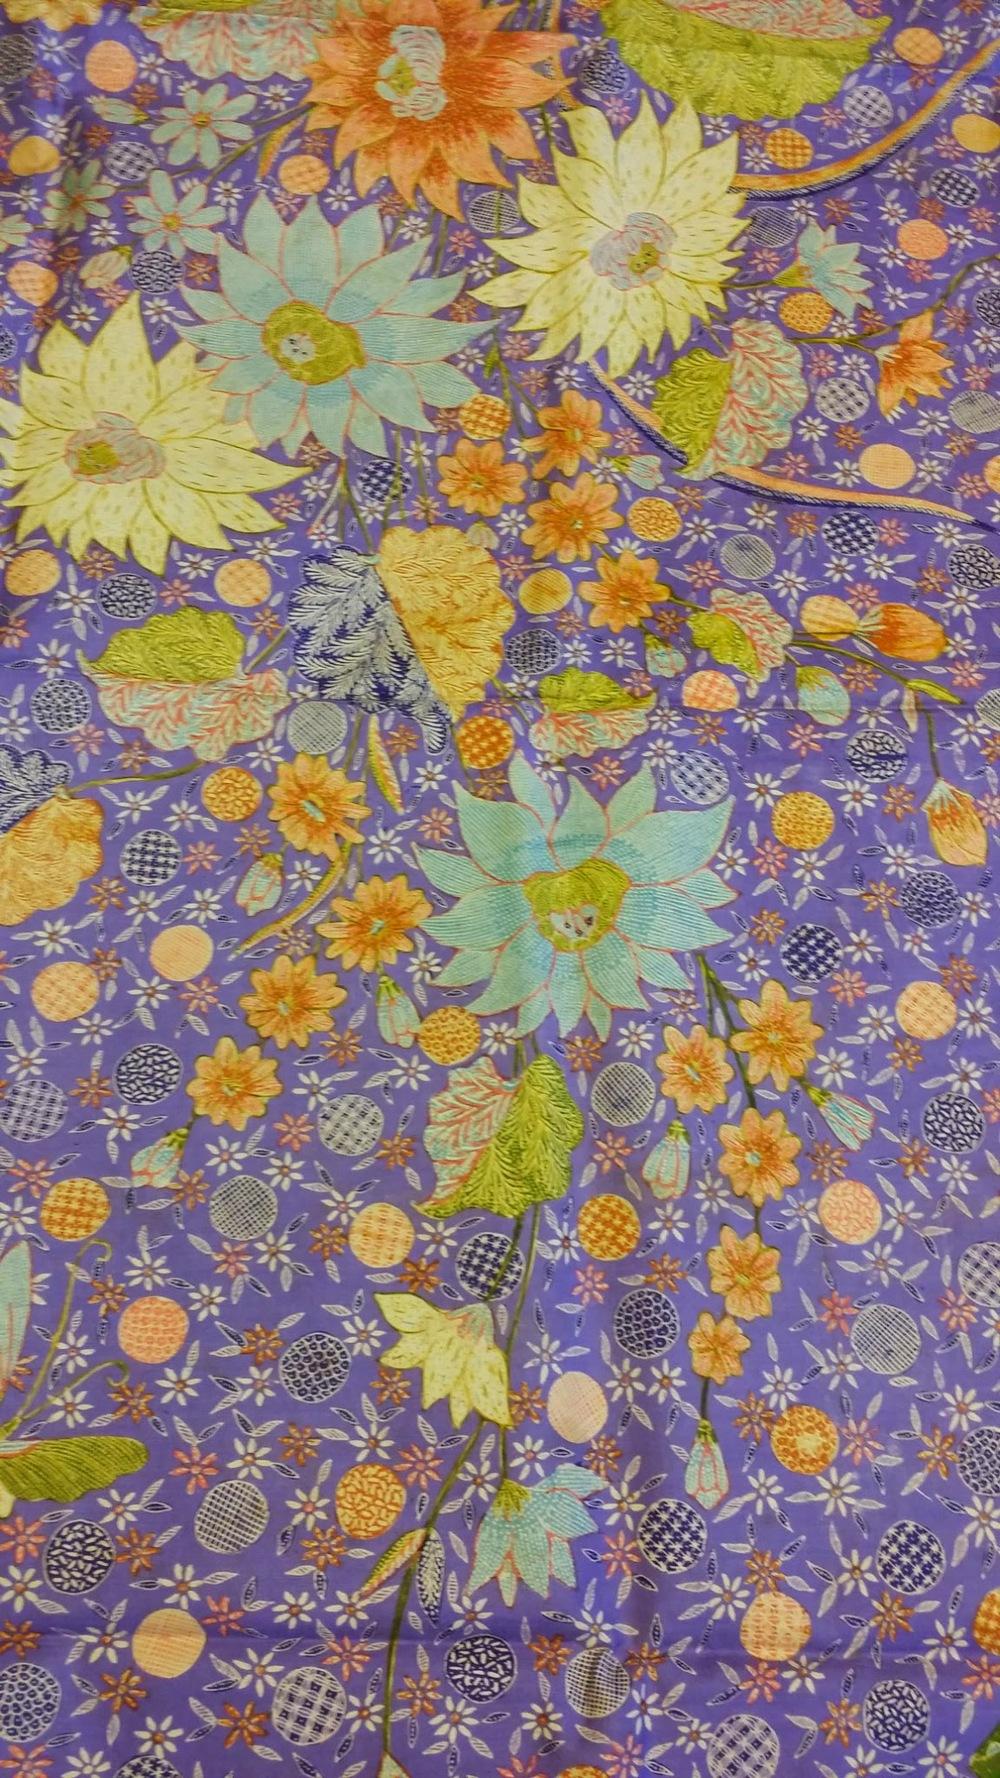 Indian Batik Textiles 6.jpg